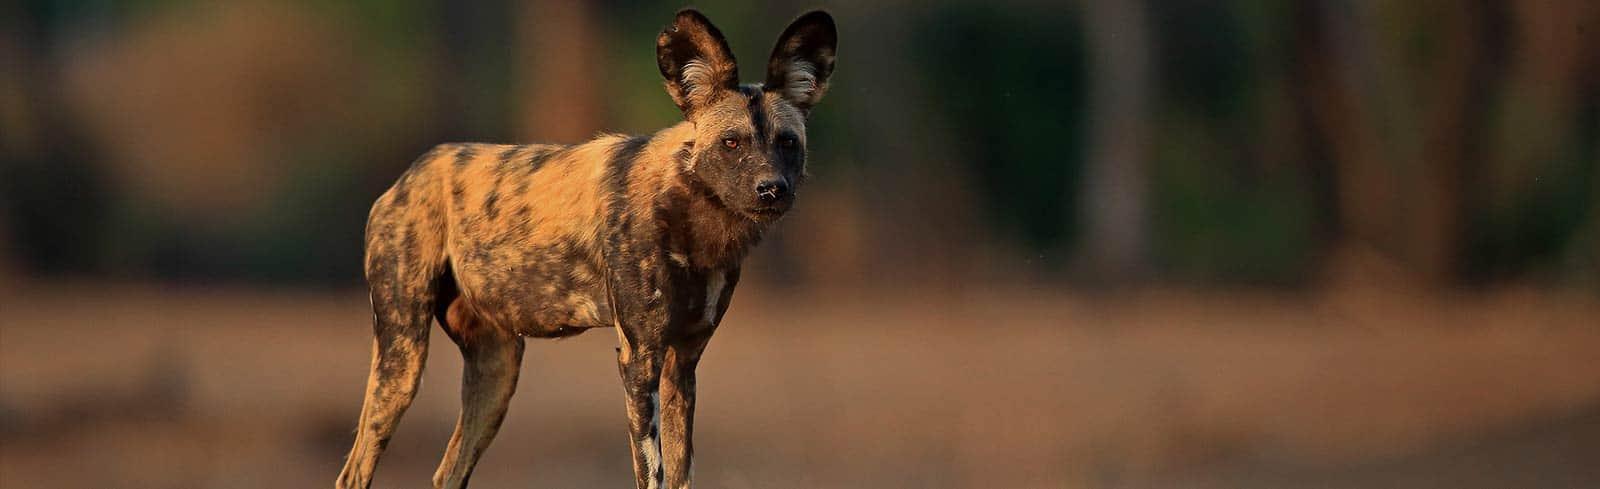 Painted Dog Bret Chrman Wildlife Photography